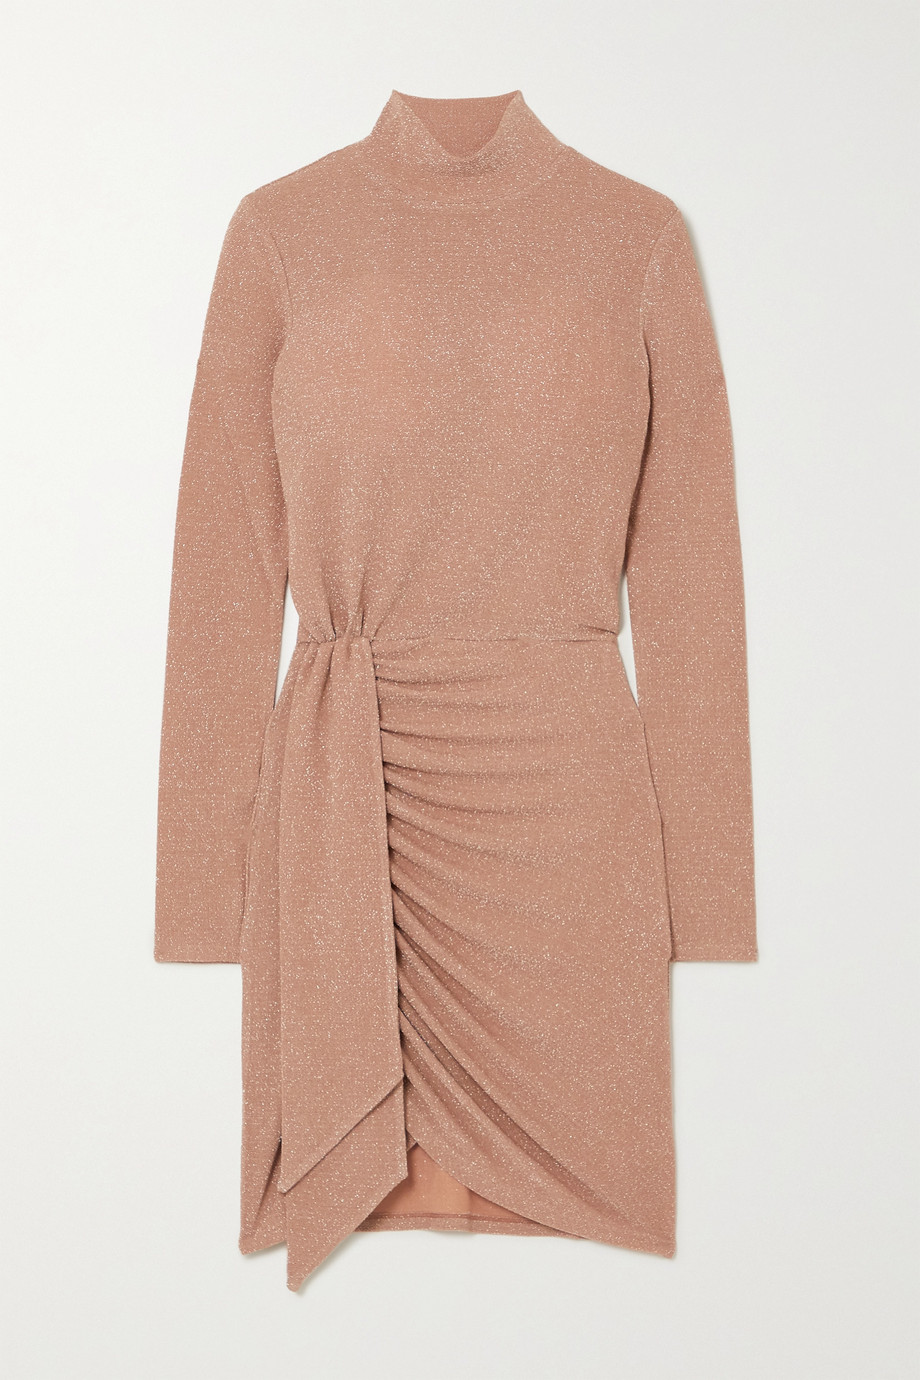 Reformation Paprika wrap-effect metallic stretch-jersey mini dress